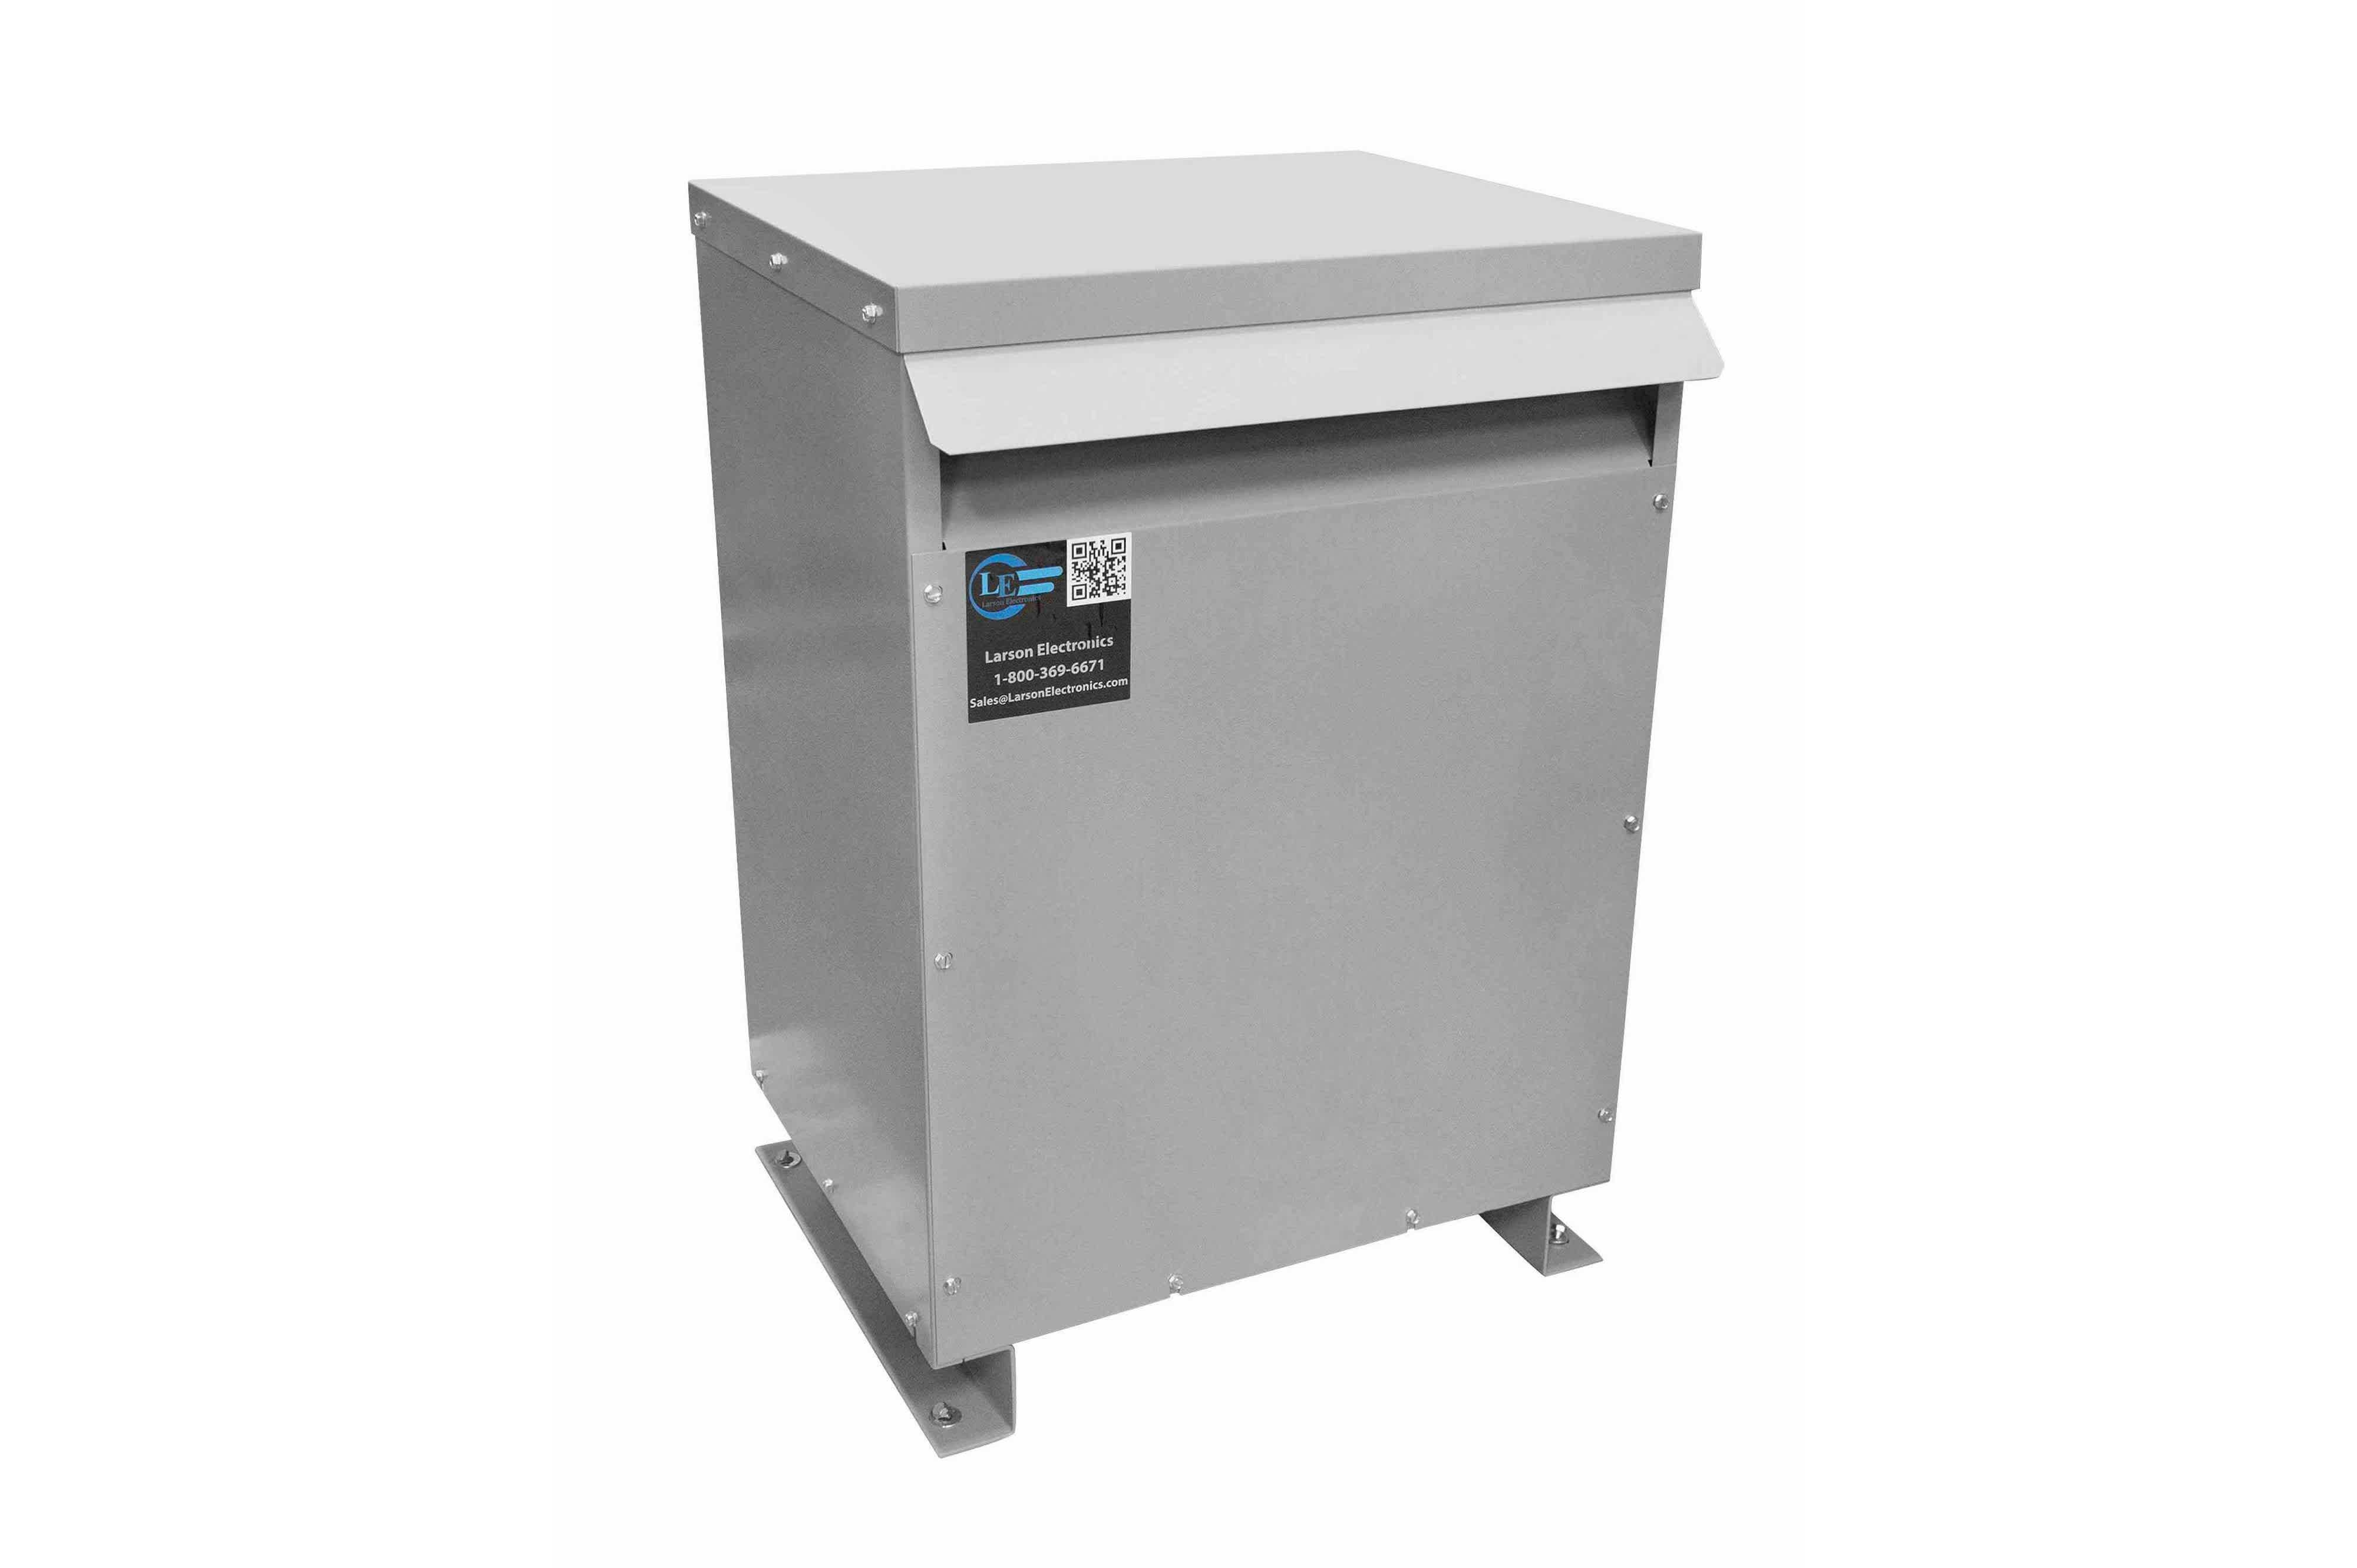 167 kVA 3PH Isolation Transformer, 415V Wye Primary, 208Y/120 Wye-N Secondary, N3R, Ventilated, 60 Hz